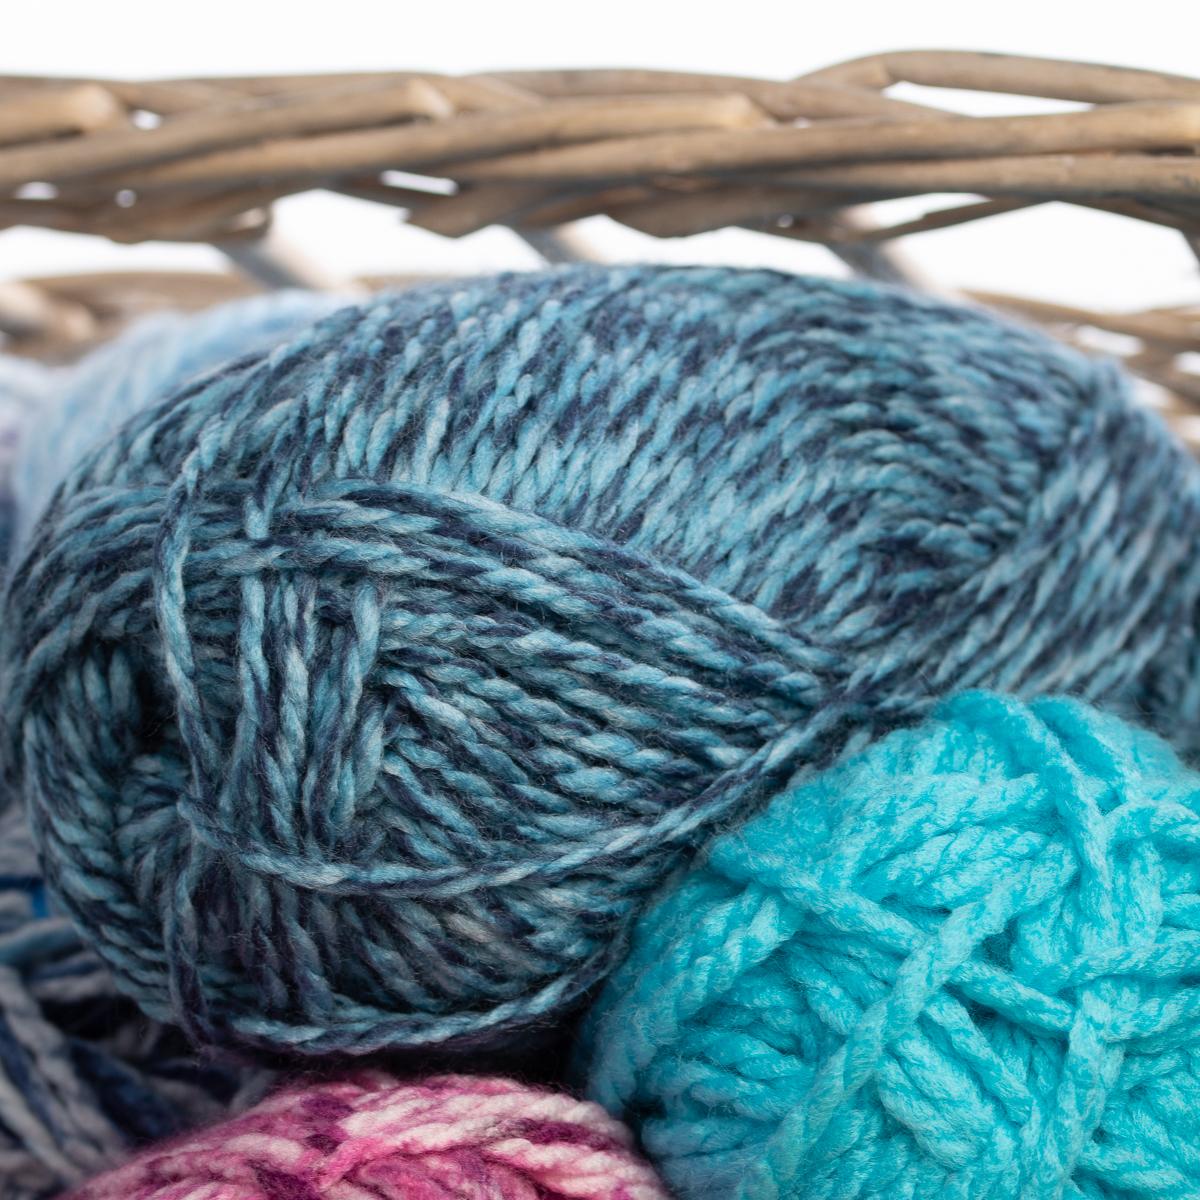 3pk-Premier-Yarns-Deborah-Norville-Serenity-100-Acrylic-Yarn-Chunky-5-Knitting thumbnail 89